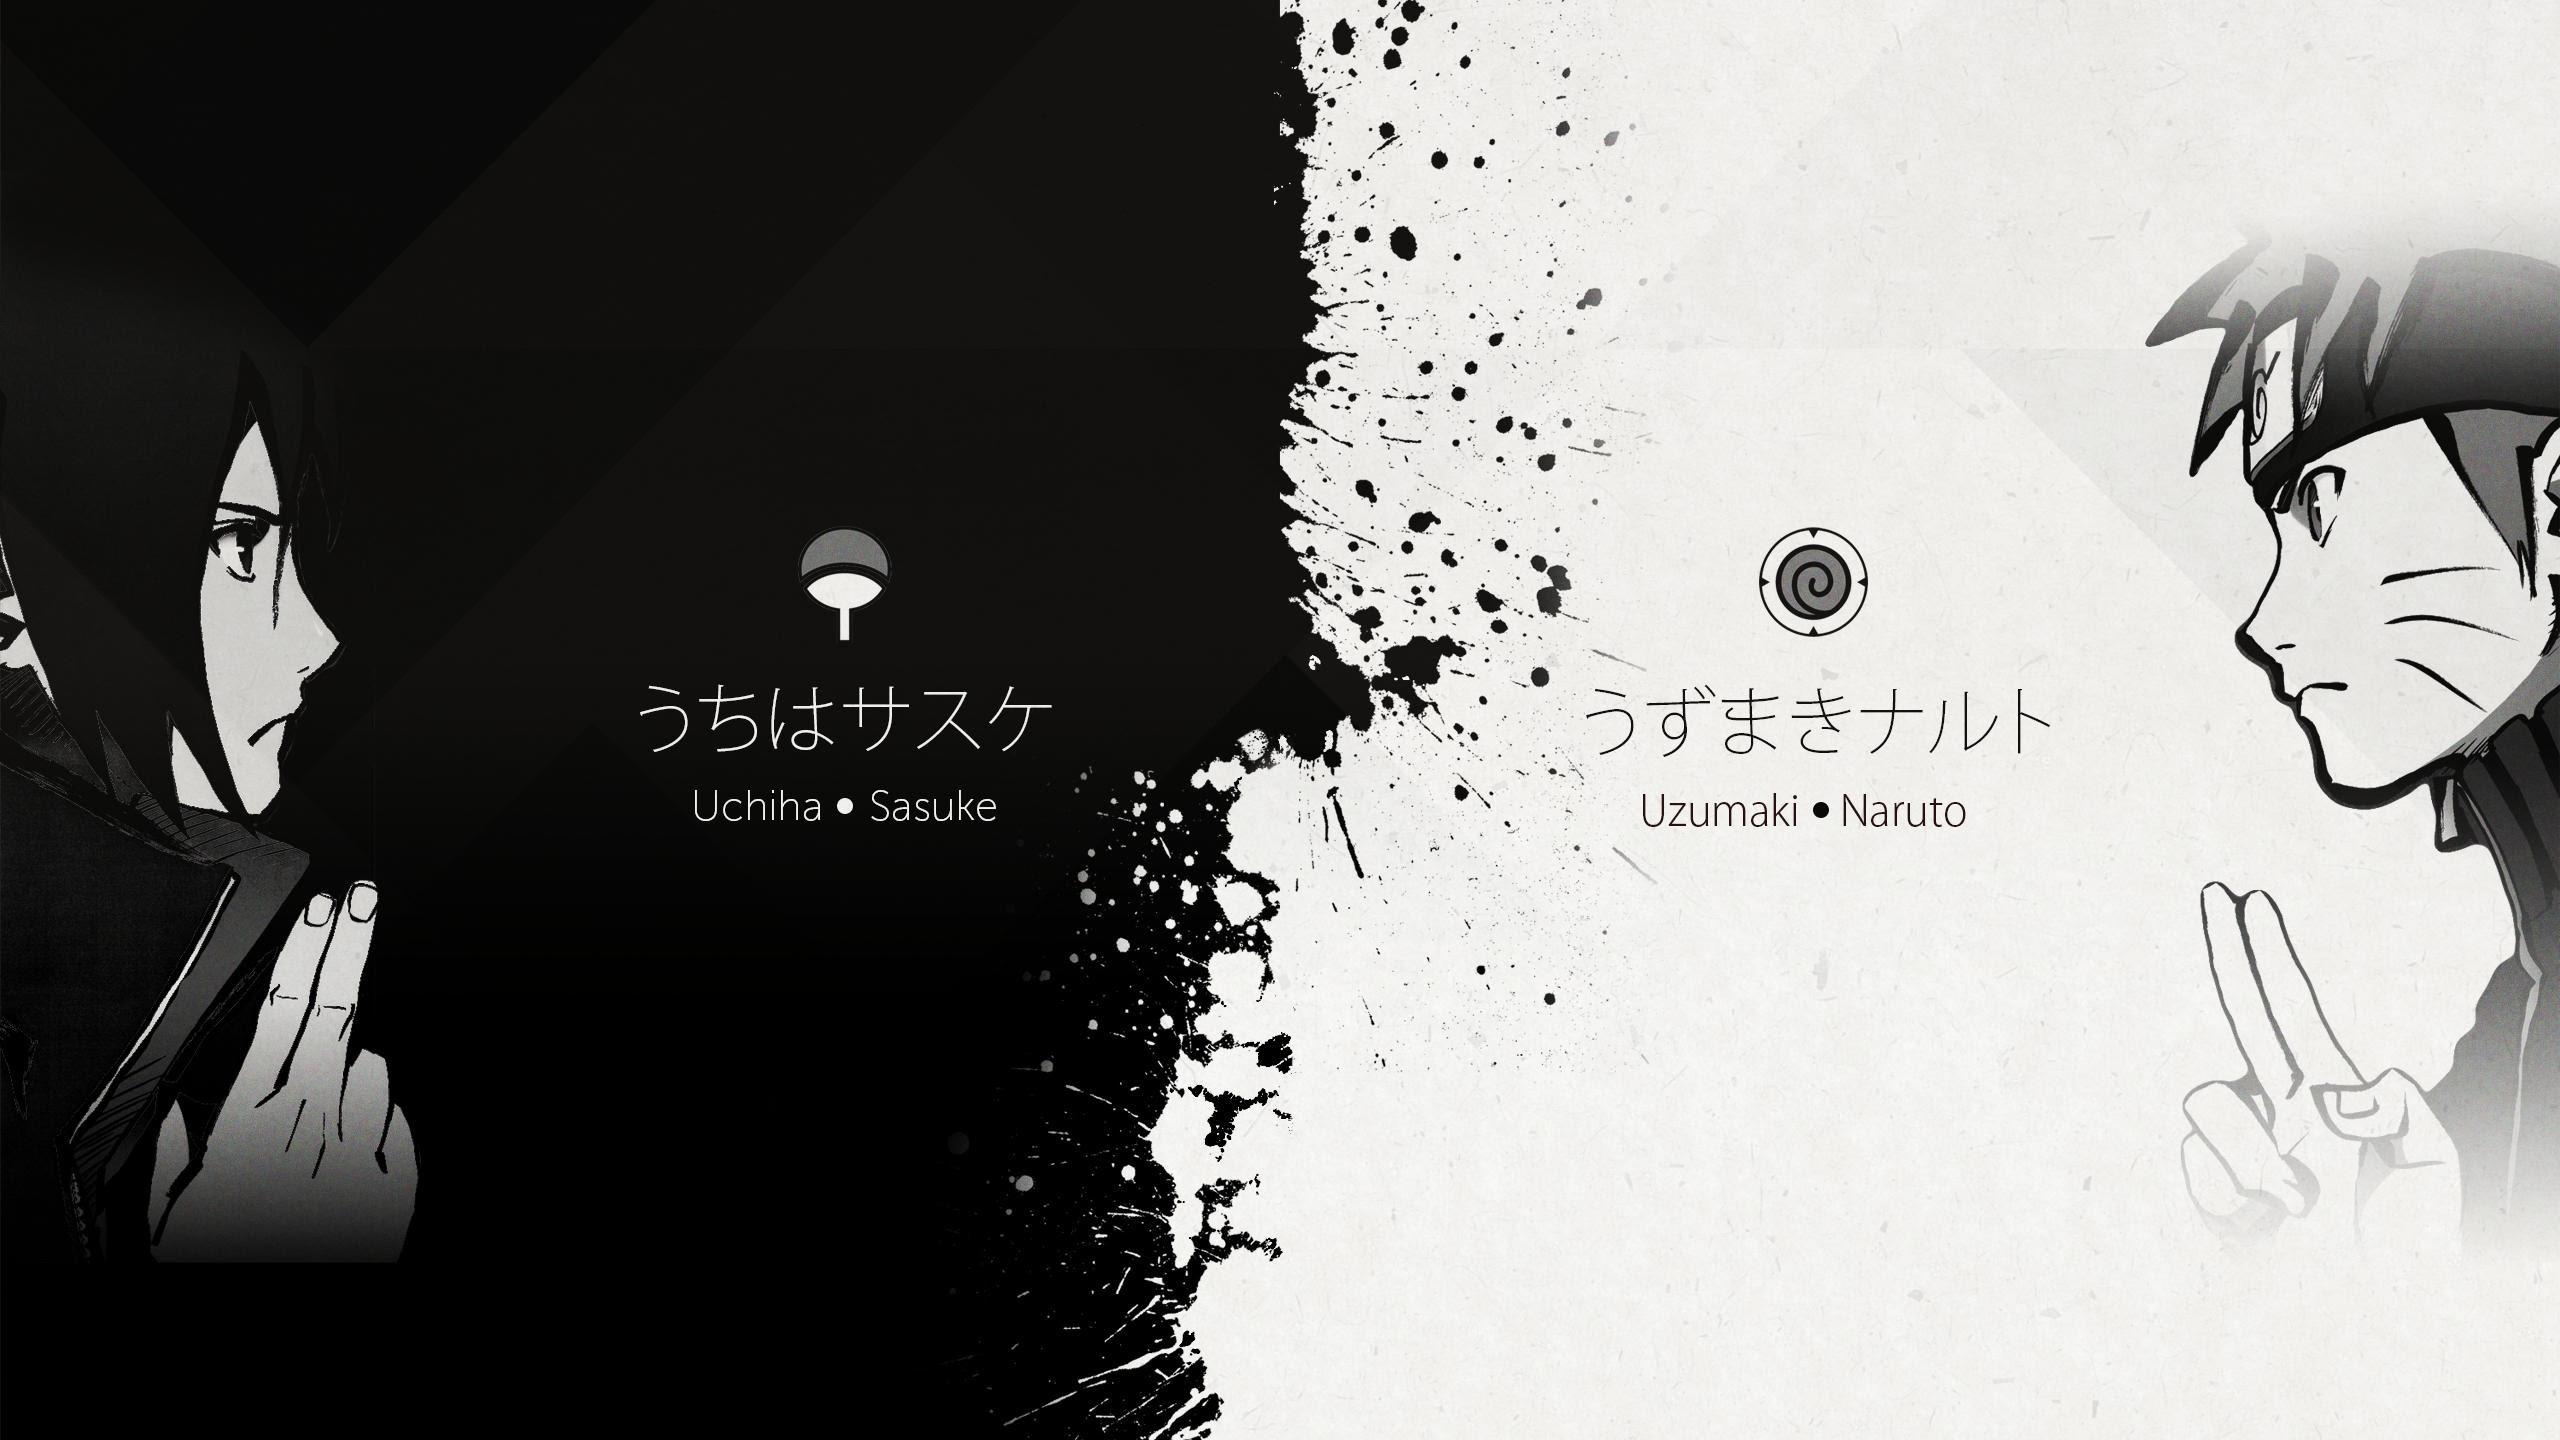 1920x1440 uchiha sasuke naruto shippuden sharingan masks anime anime boys mangekyou sharingan tobi rinnegan b art hd a· download